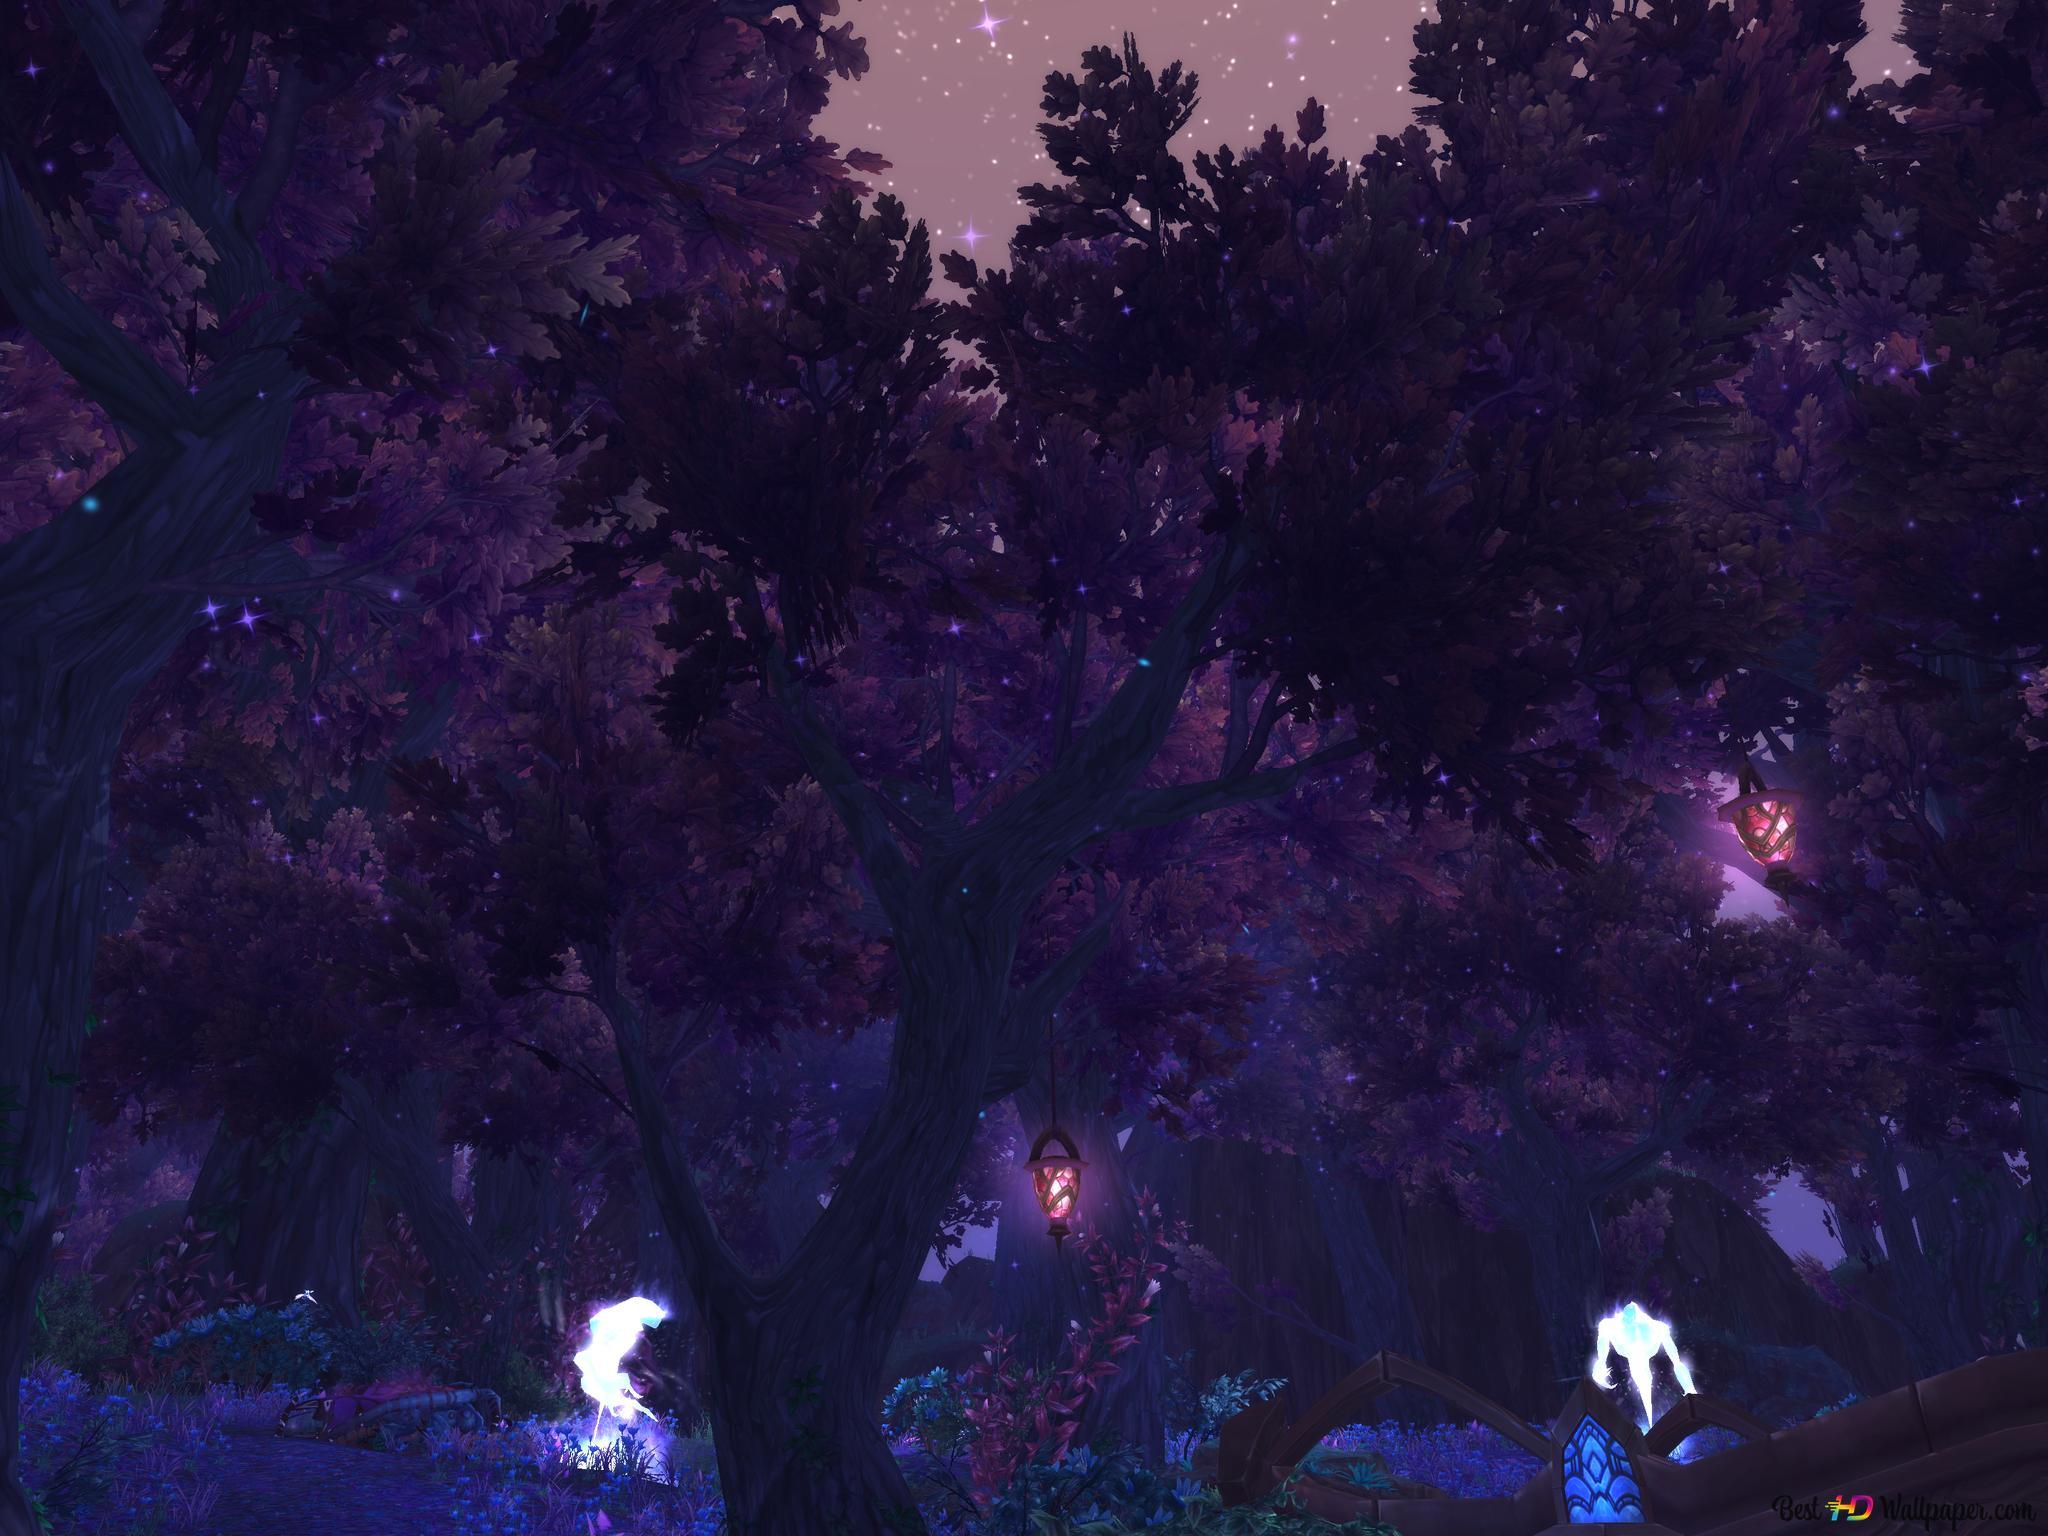 Descargar Fondo De Pantalla World Of Warcraft Mystic Forest Hd